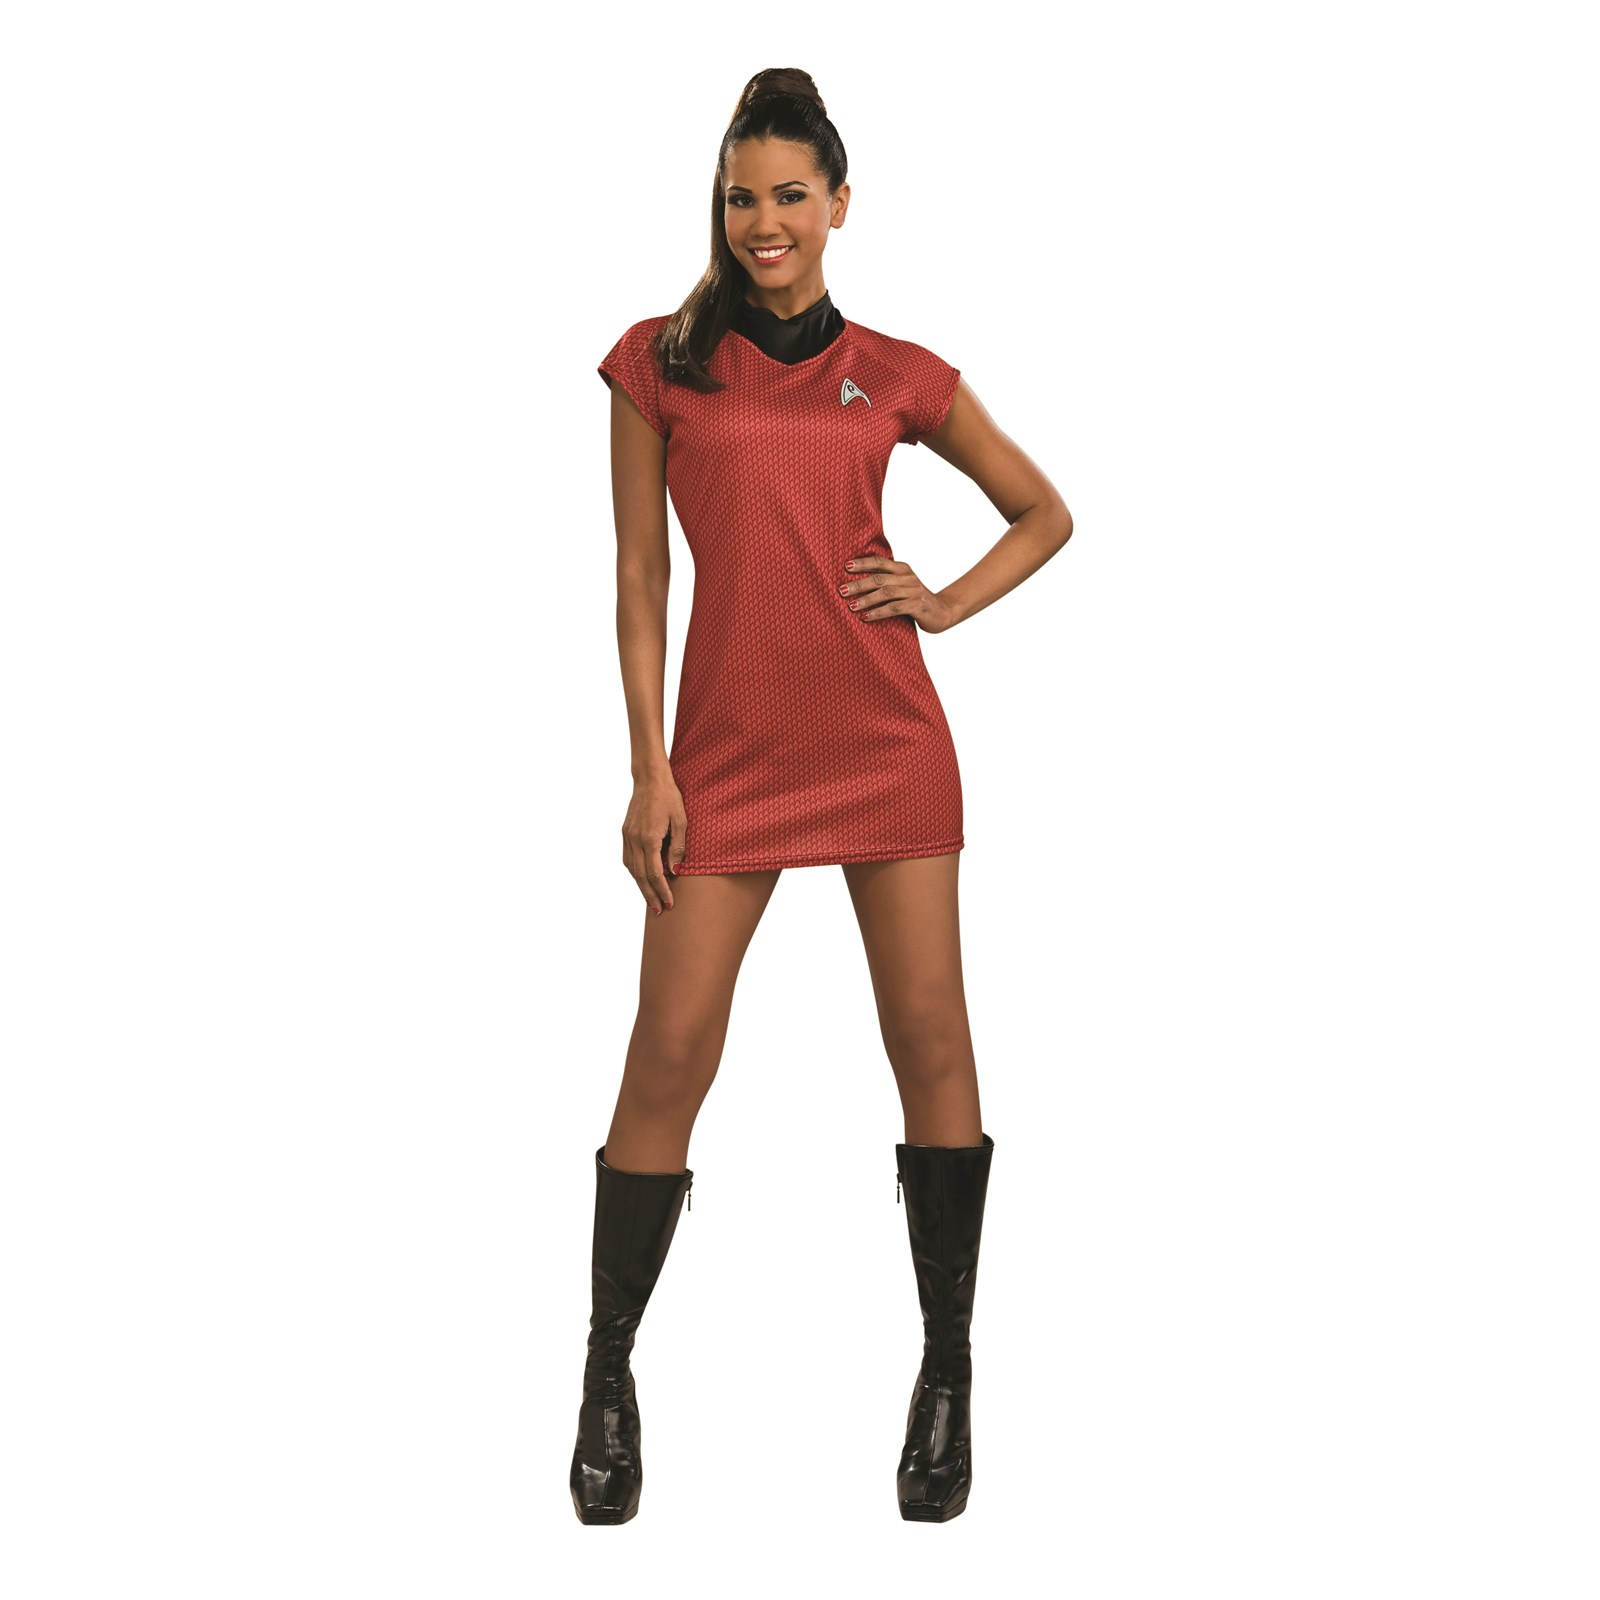 Star Trek Movie Red Dress Deluxe Adult Costume | BuyCostumes.com